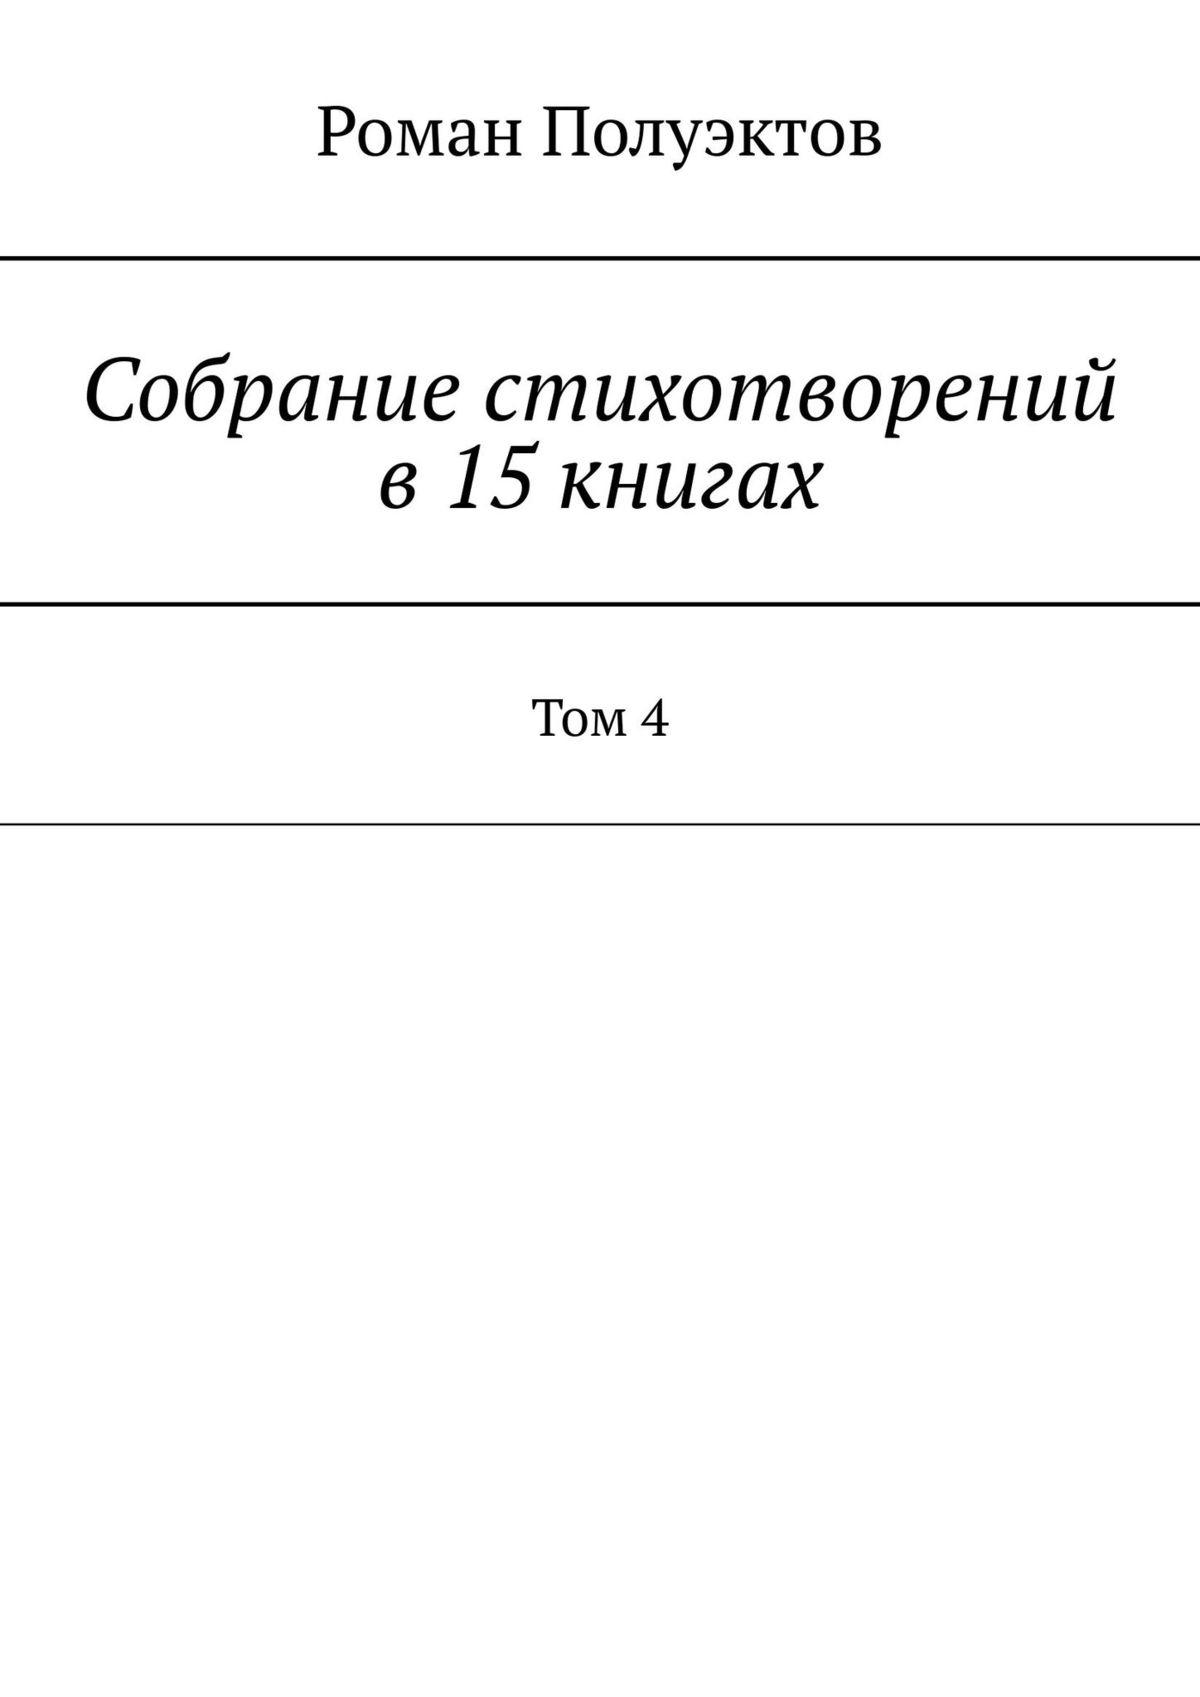 Роман Полуэктов Собраниестихотворений в15книгах. Том4 аппиано алессандра завтра все наладится роман